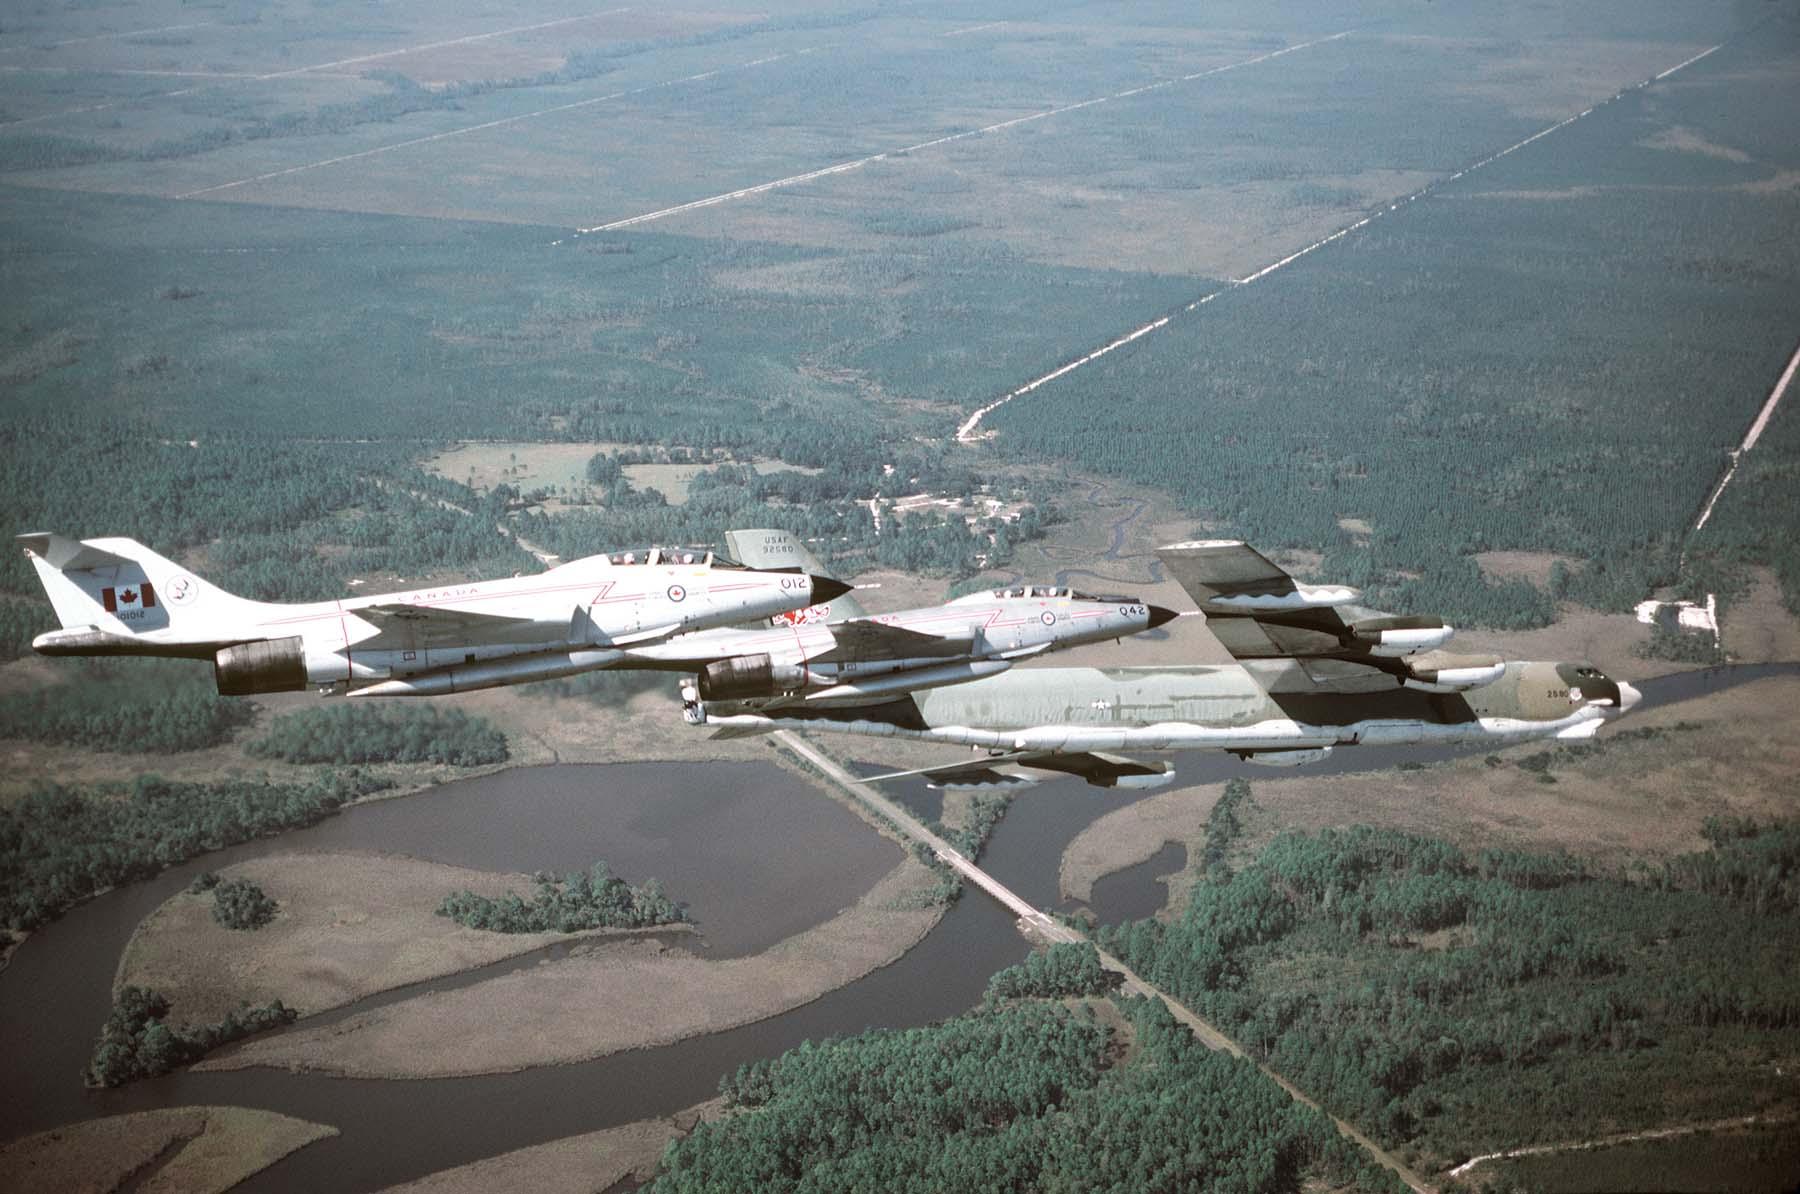 McDonnell F-101B Voodoo Photo Gallery